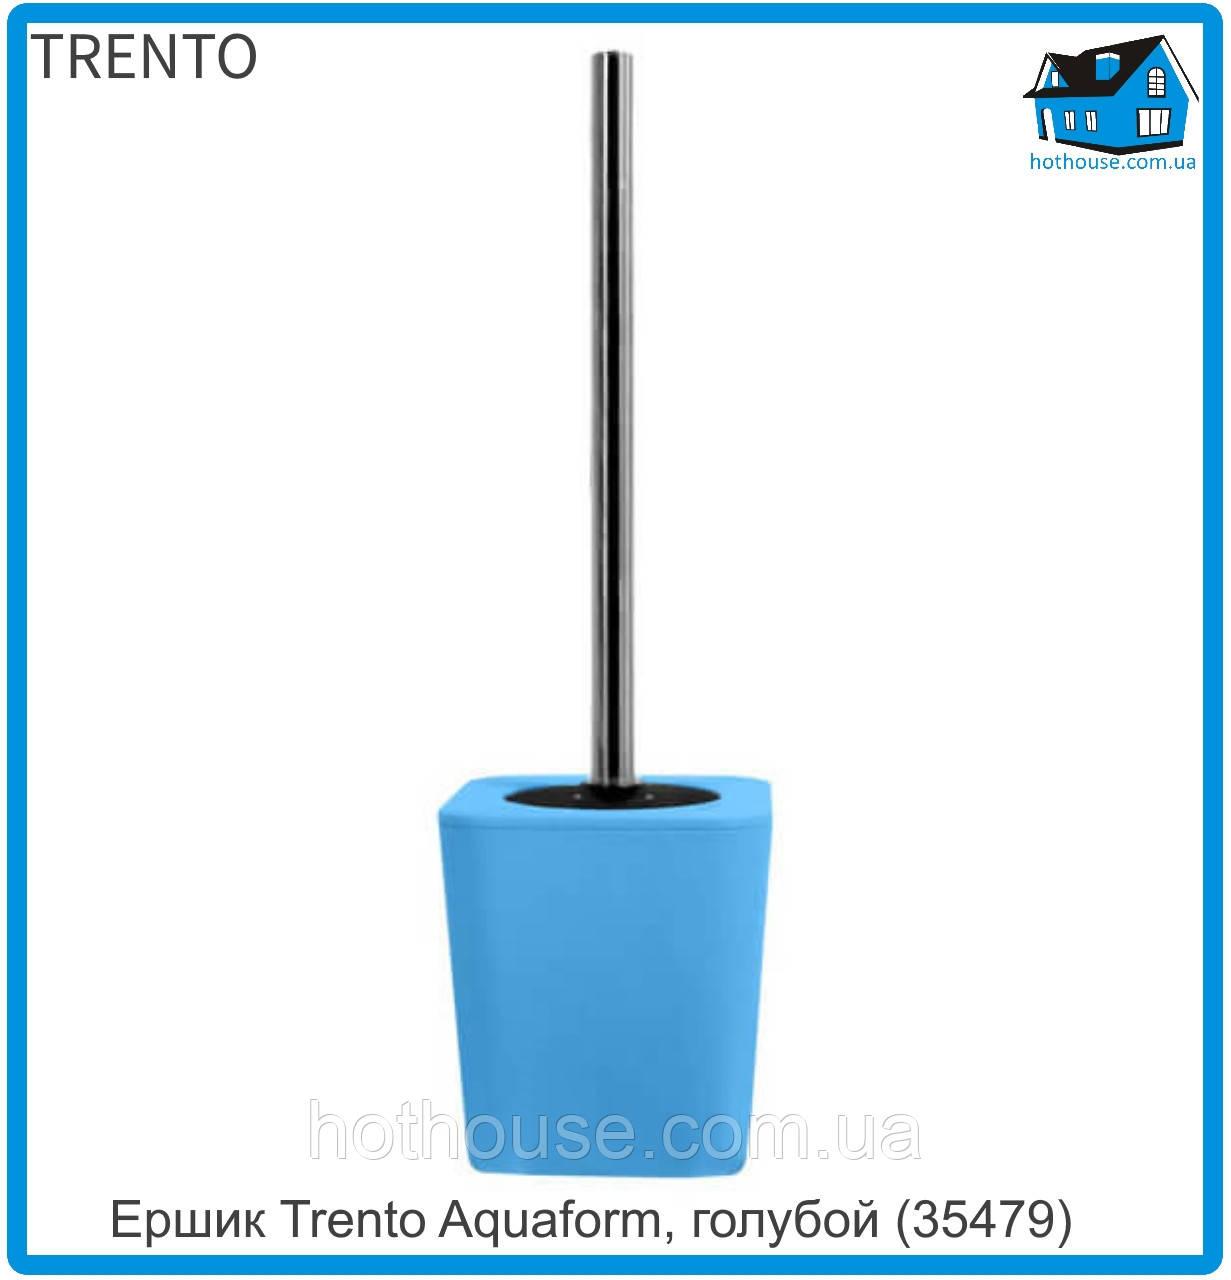 Йоршик для унітазу Trento Aquaform, блакитний (35479)